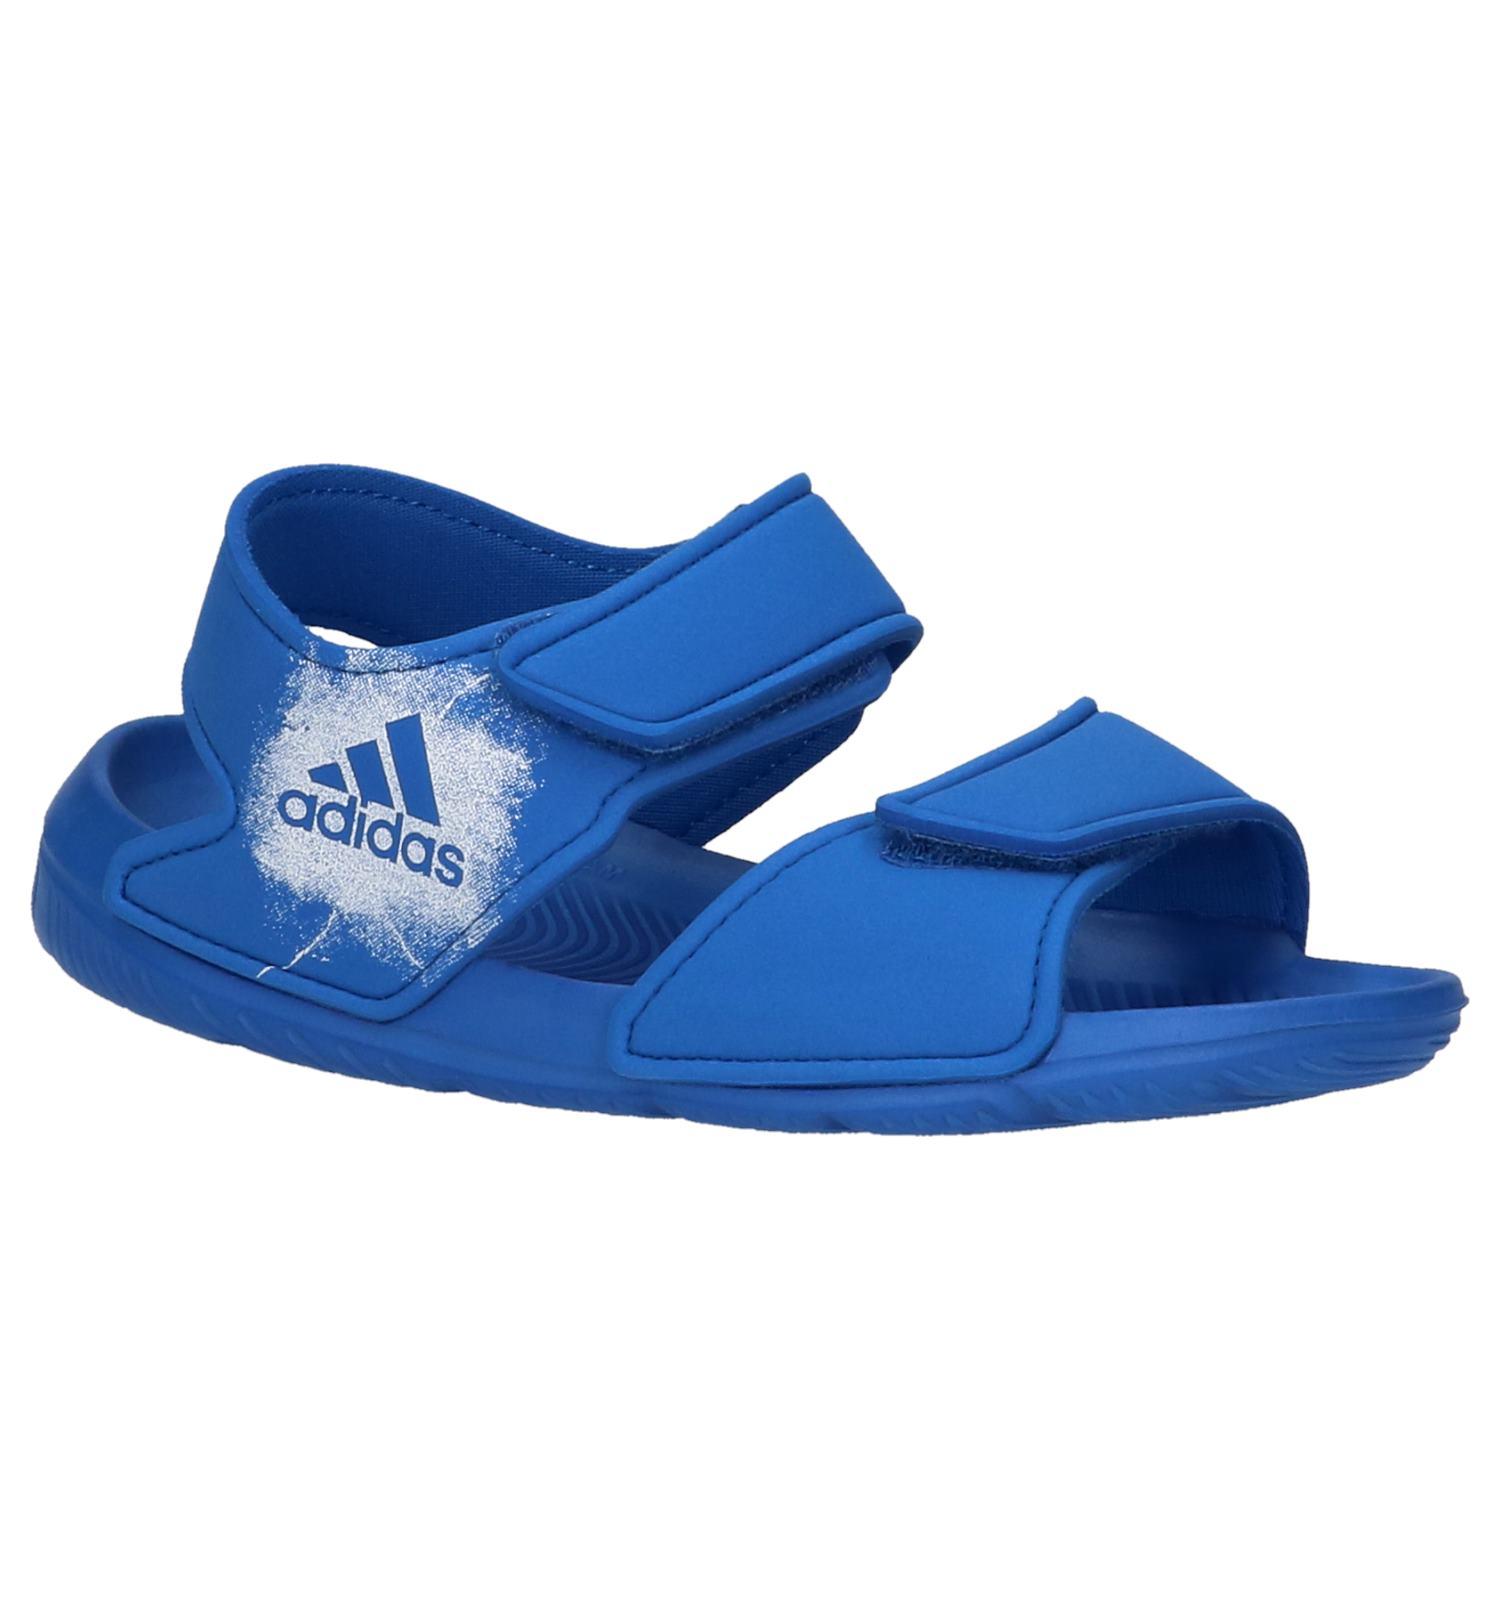 0a95edac39c Watersandalen Blauw adidas Altaswim | TORFS.BE | Gratis verzend en retour